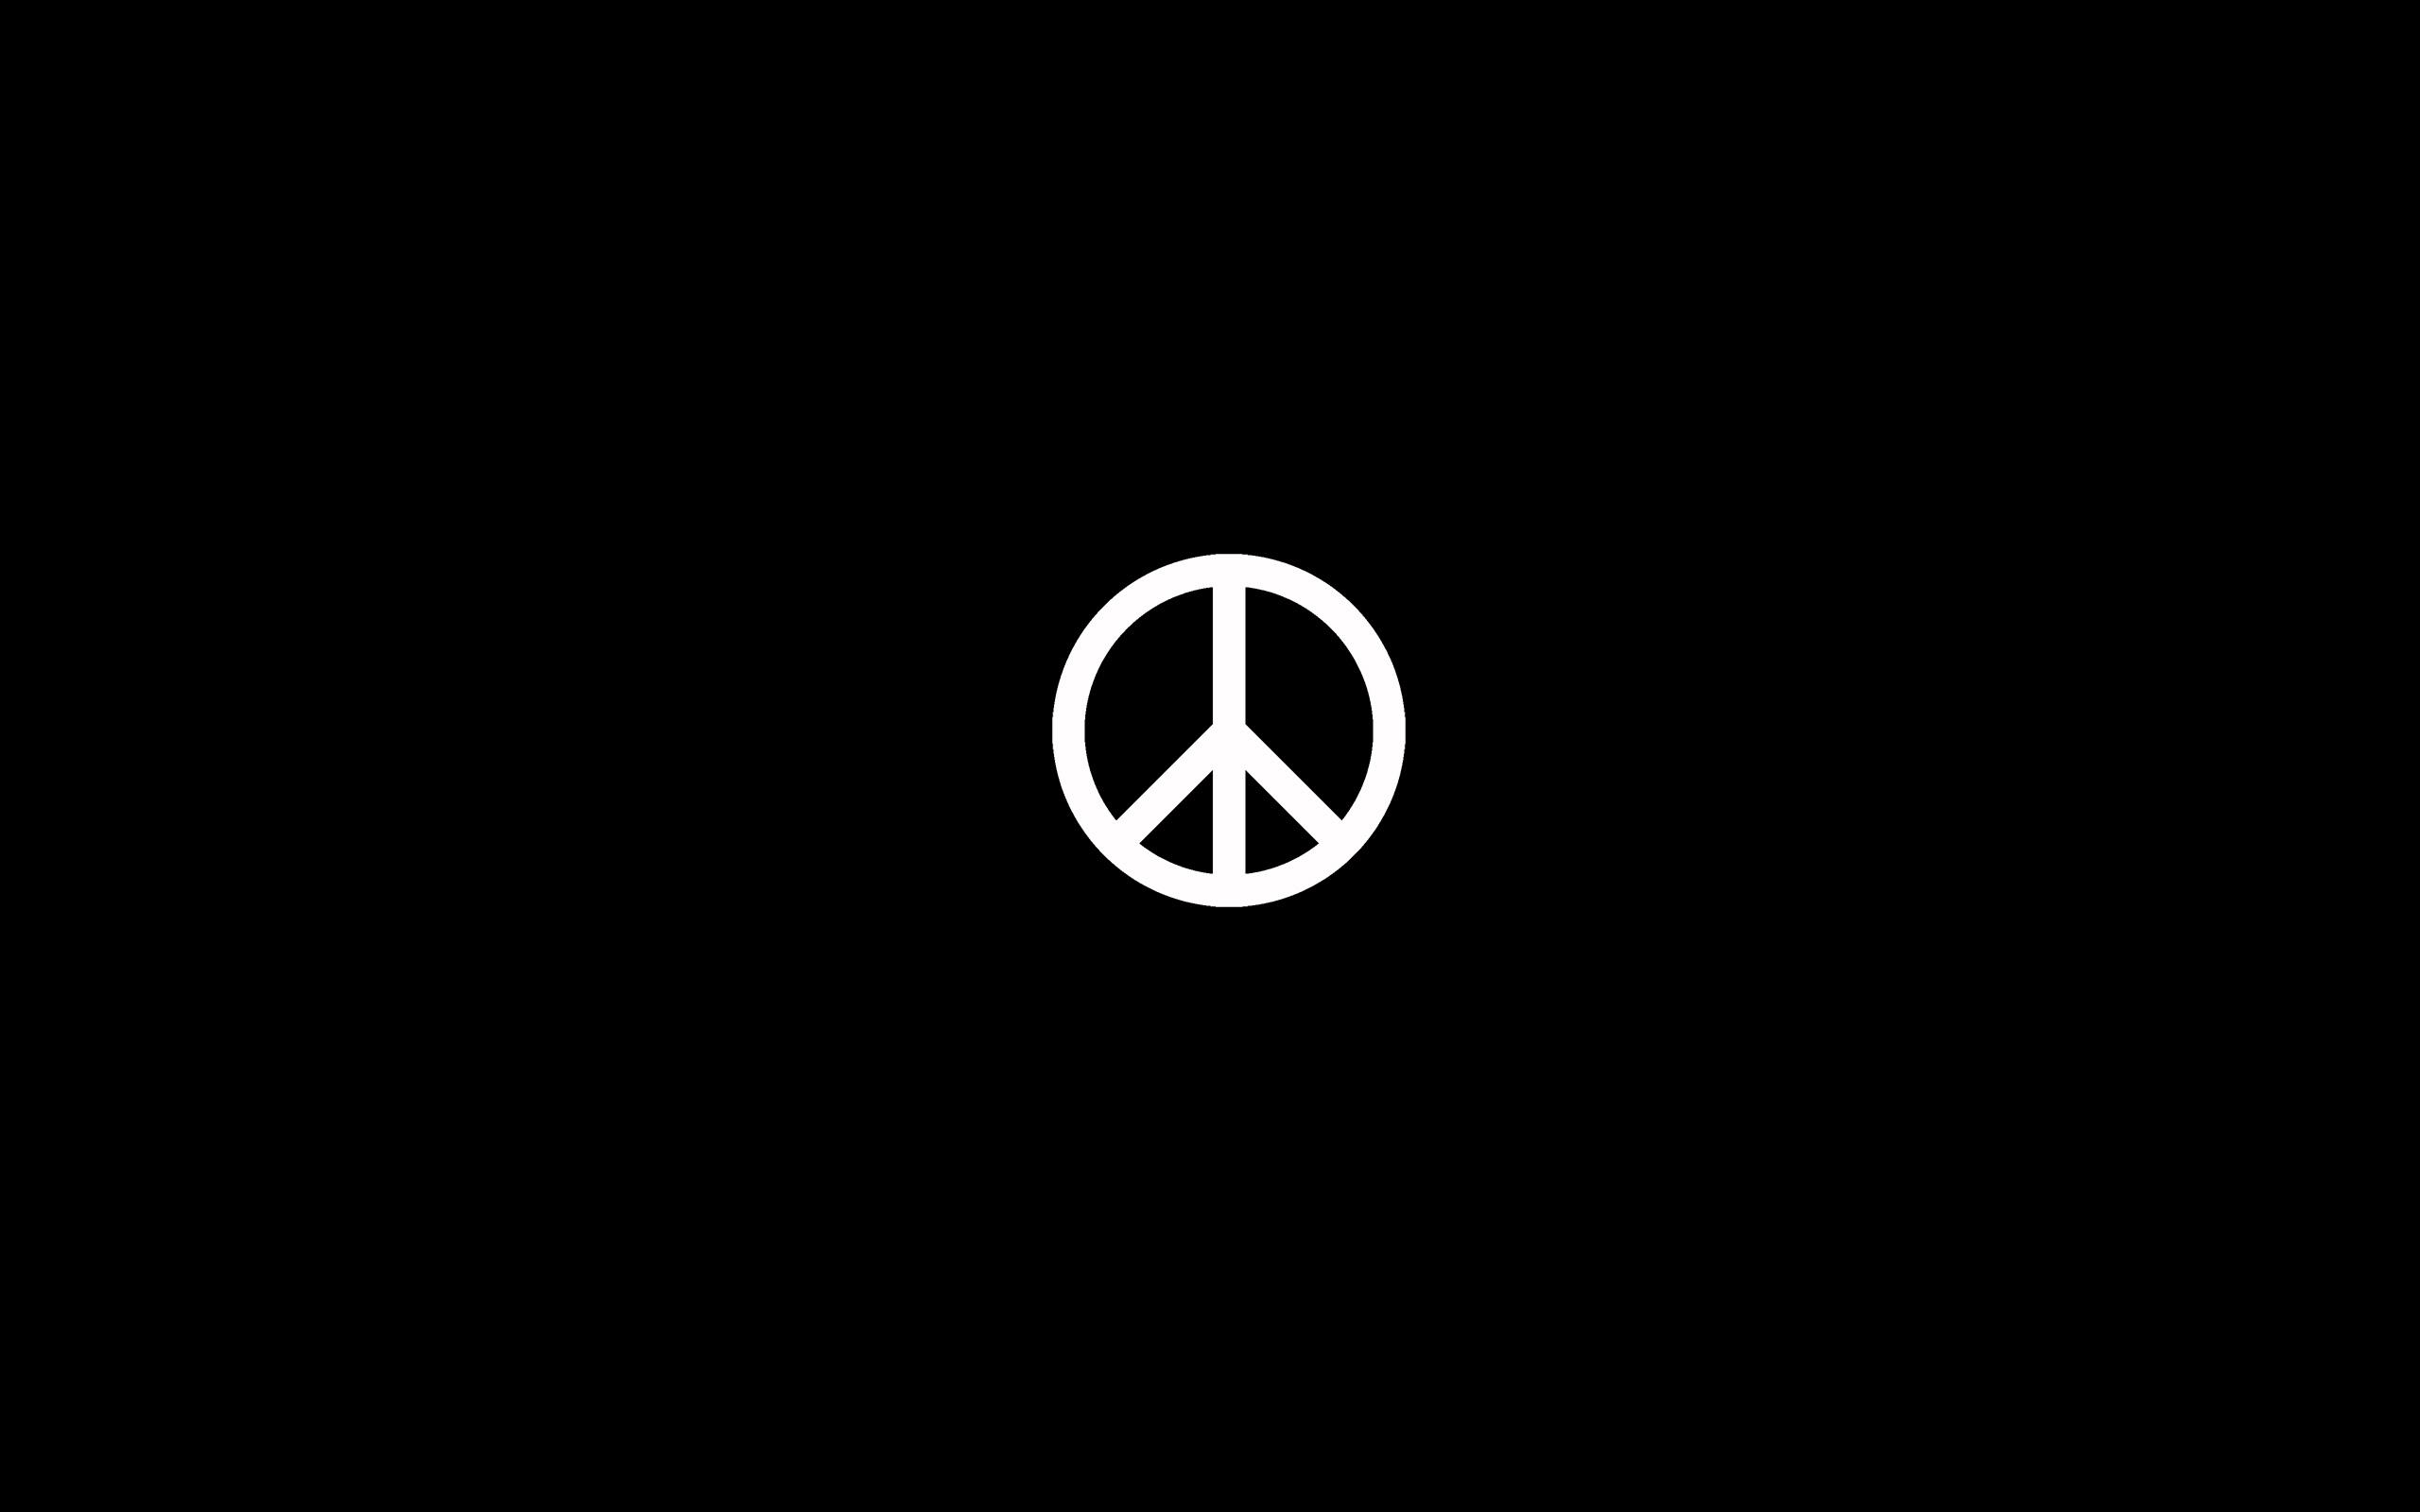 Peace Sign Wallpaper 2560x1600 55785